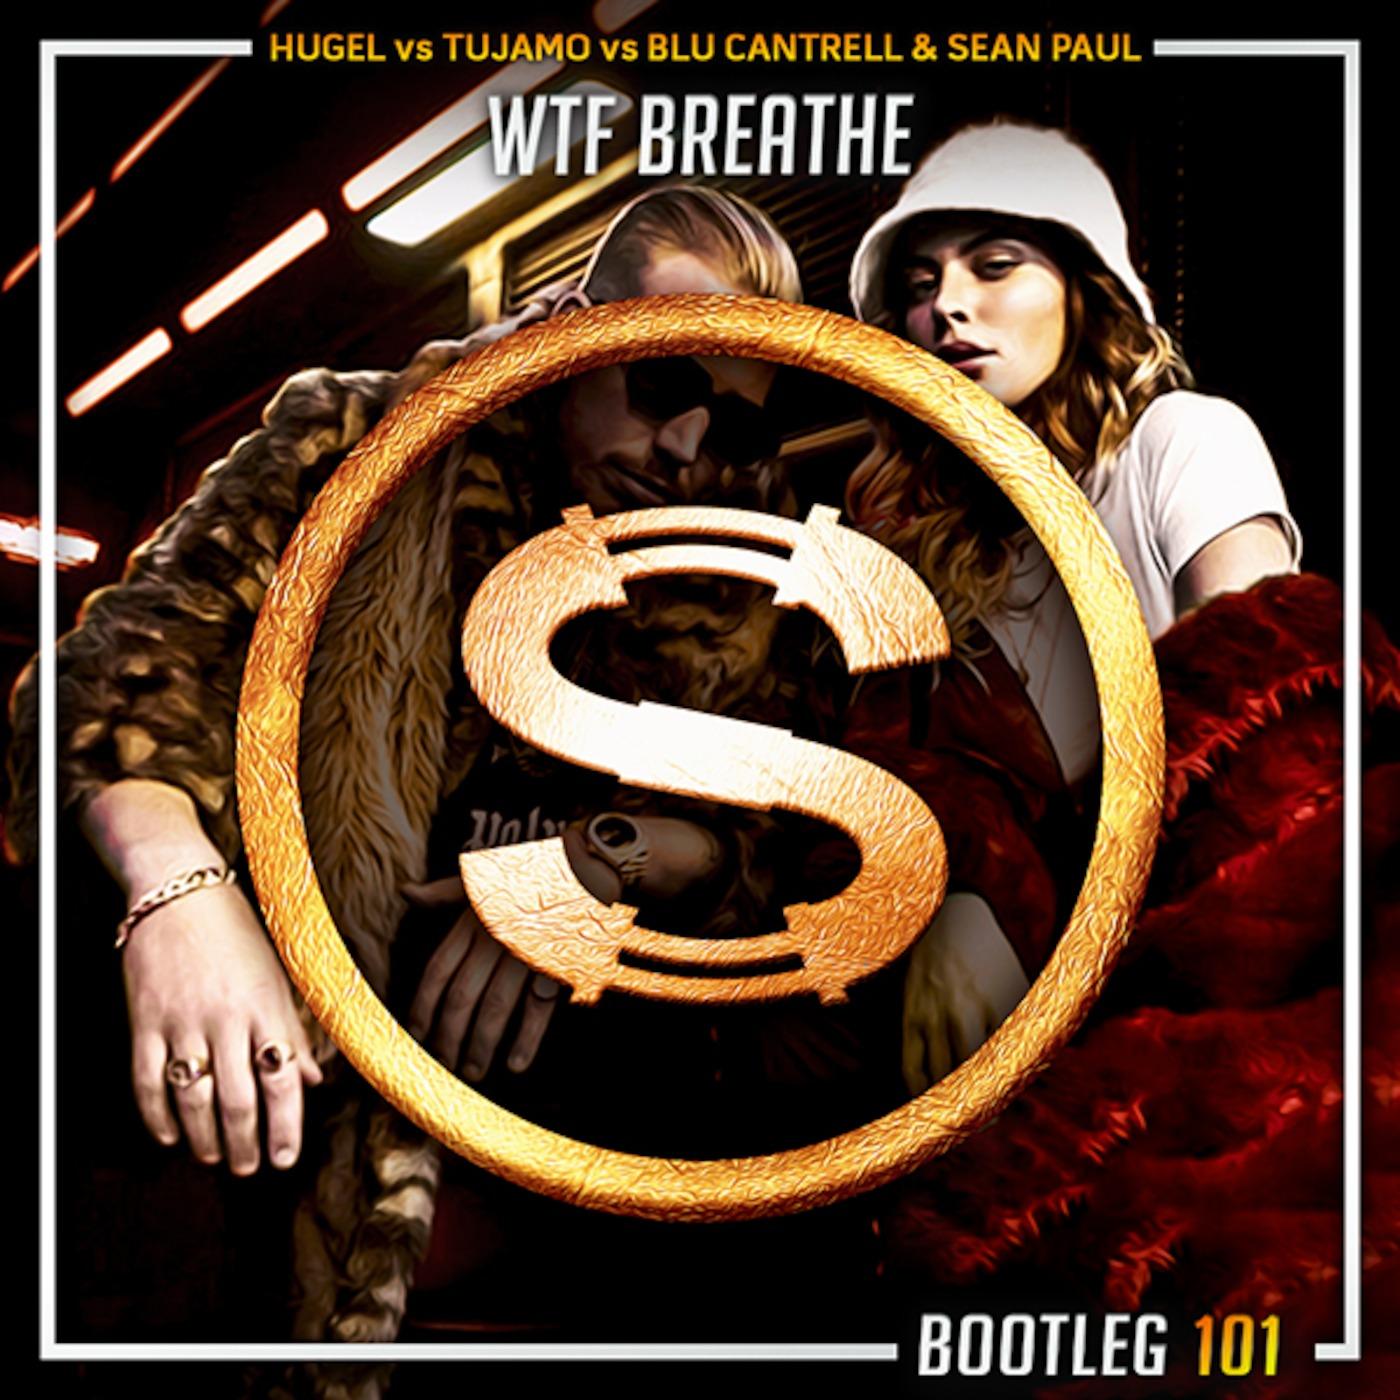 Hugel vs Tujamo vs Blu Cantrell x Sean Paul - Wtf Breathe (Da Sylva bootleg)